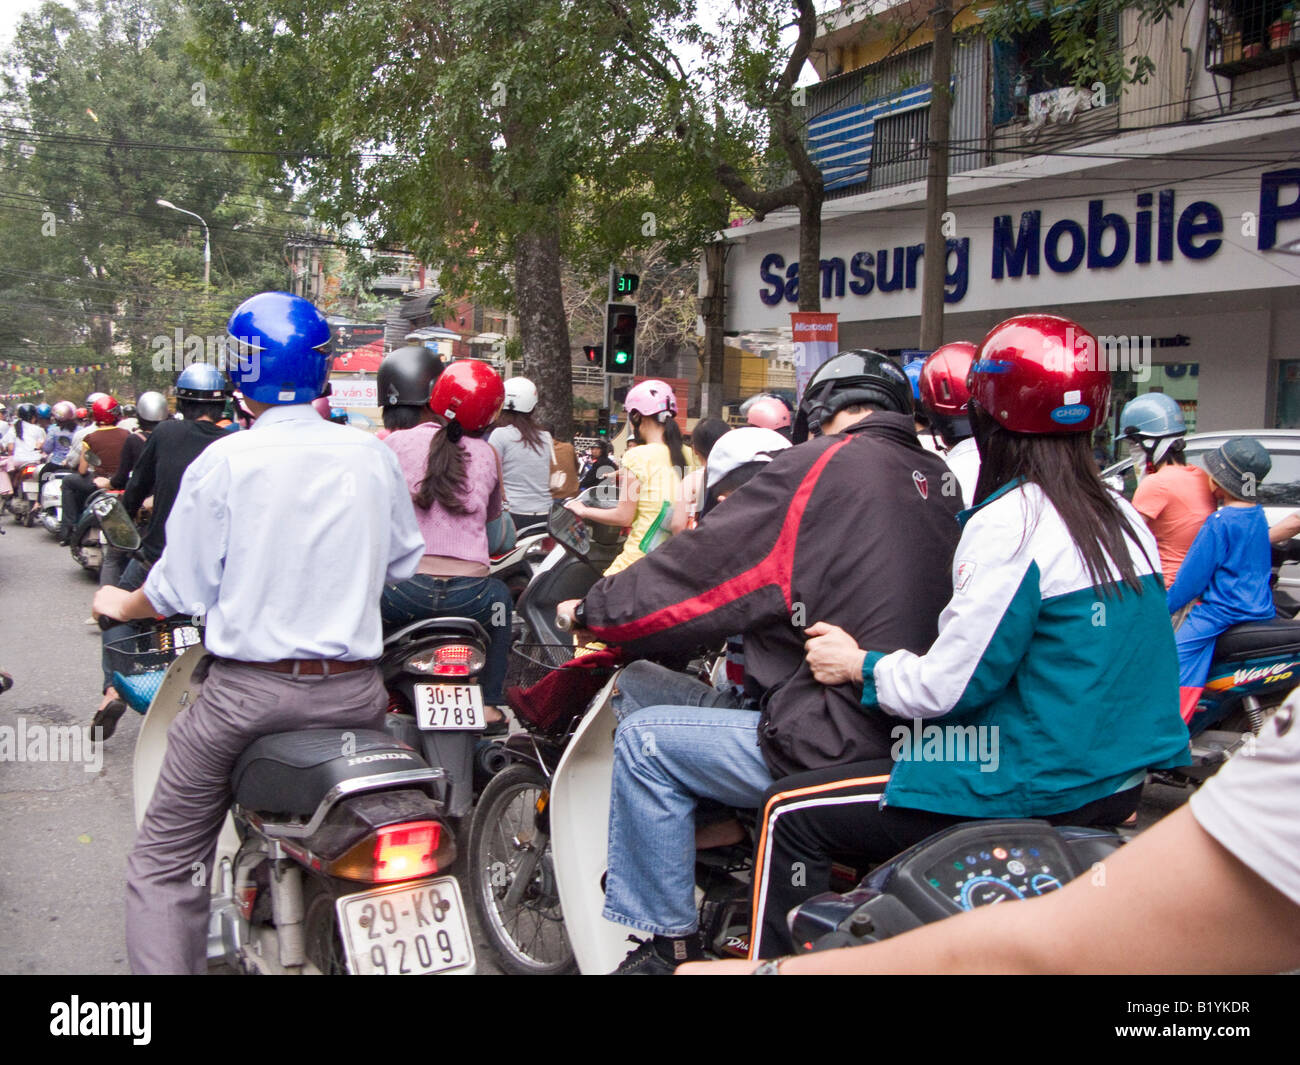 motorbike traffic in busy street in Hanoi, Vietnam - Stock Image